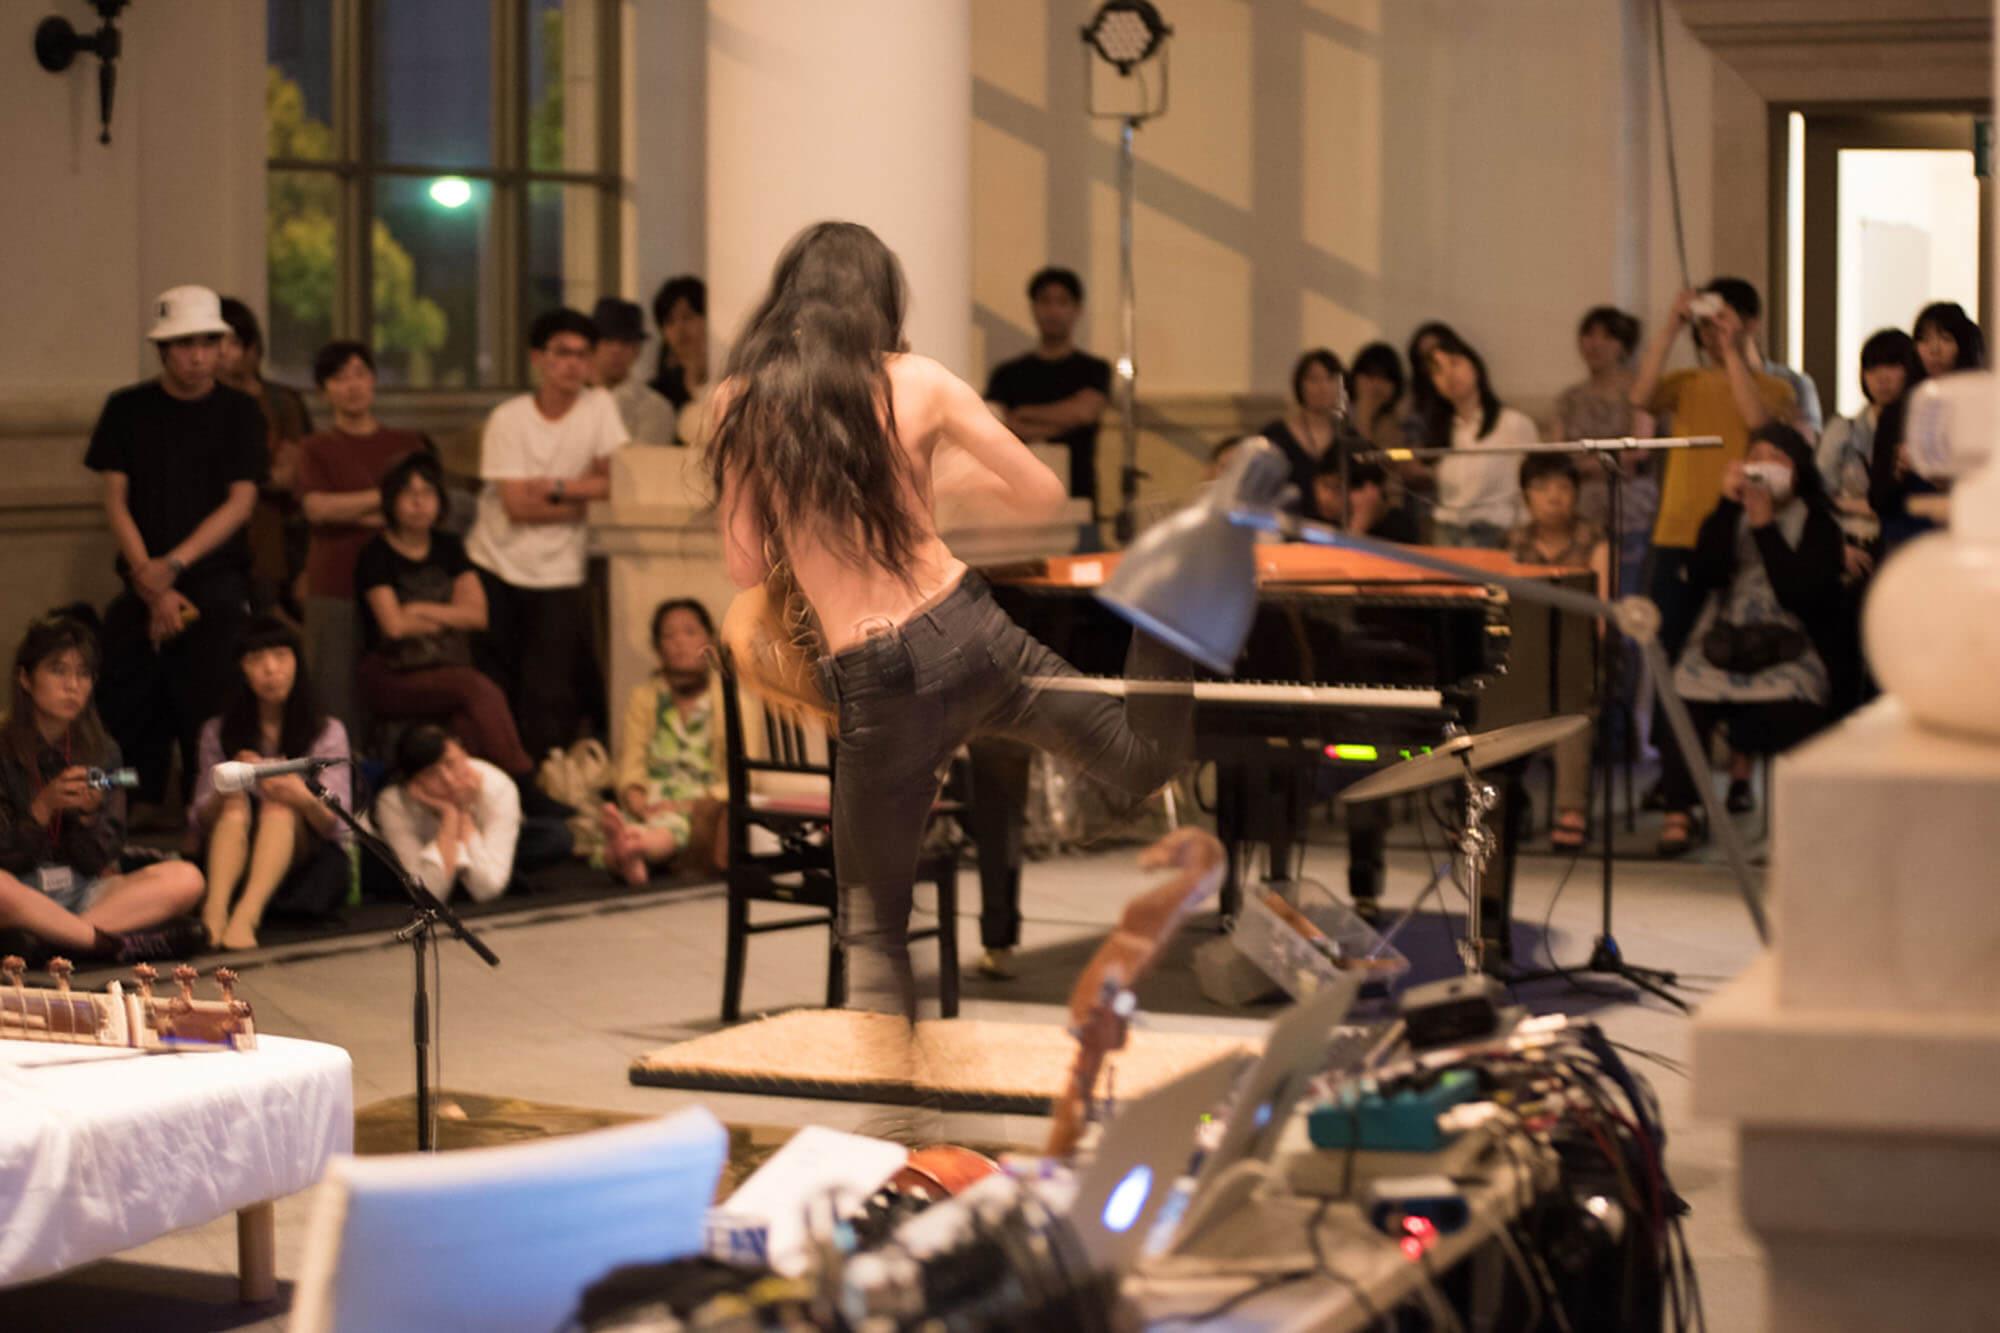 YCC Temporary 山川冬樹|offsociety inc. YCC Temporary Fuyuki Yamakawa 現代美術・アート Contemporary Art